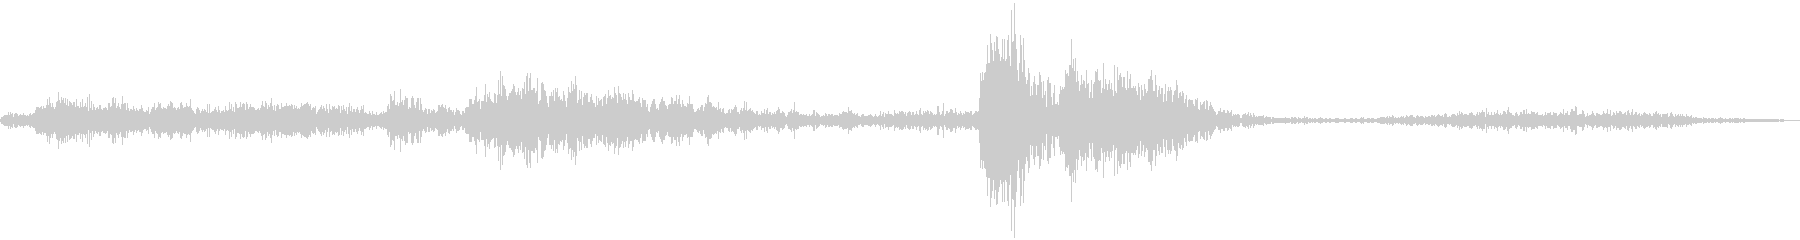 FX_48 Data Transの未再生の波形